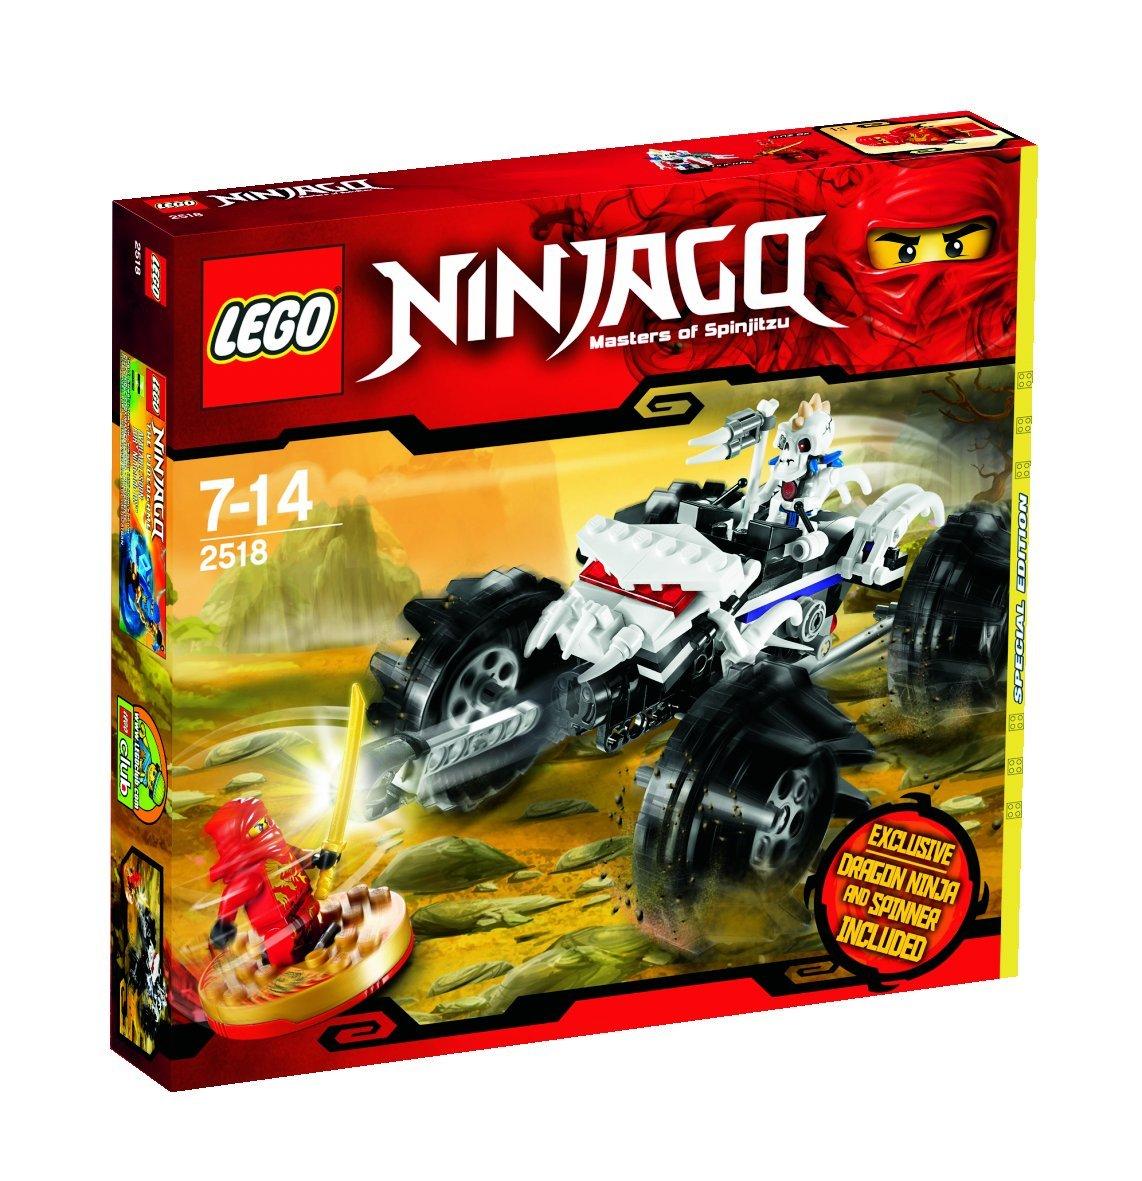 LEGO Ninjago – Meister des Spinjitzu 2518 mit Dragon Ninja und Spinner